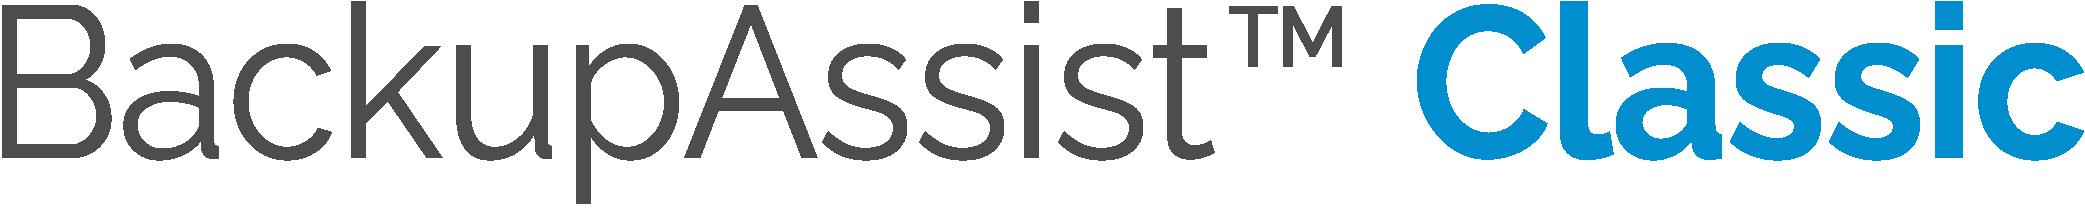 BackupAssist-Product-Logos_Classic